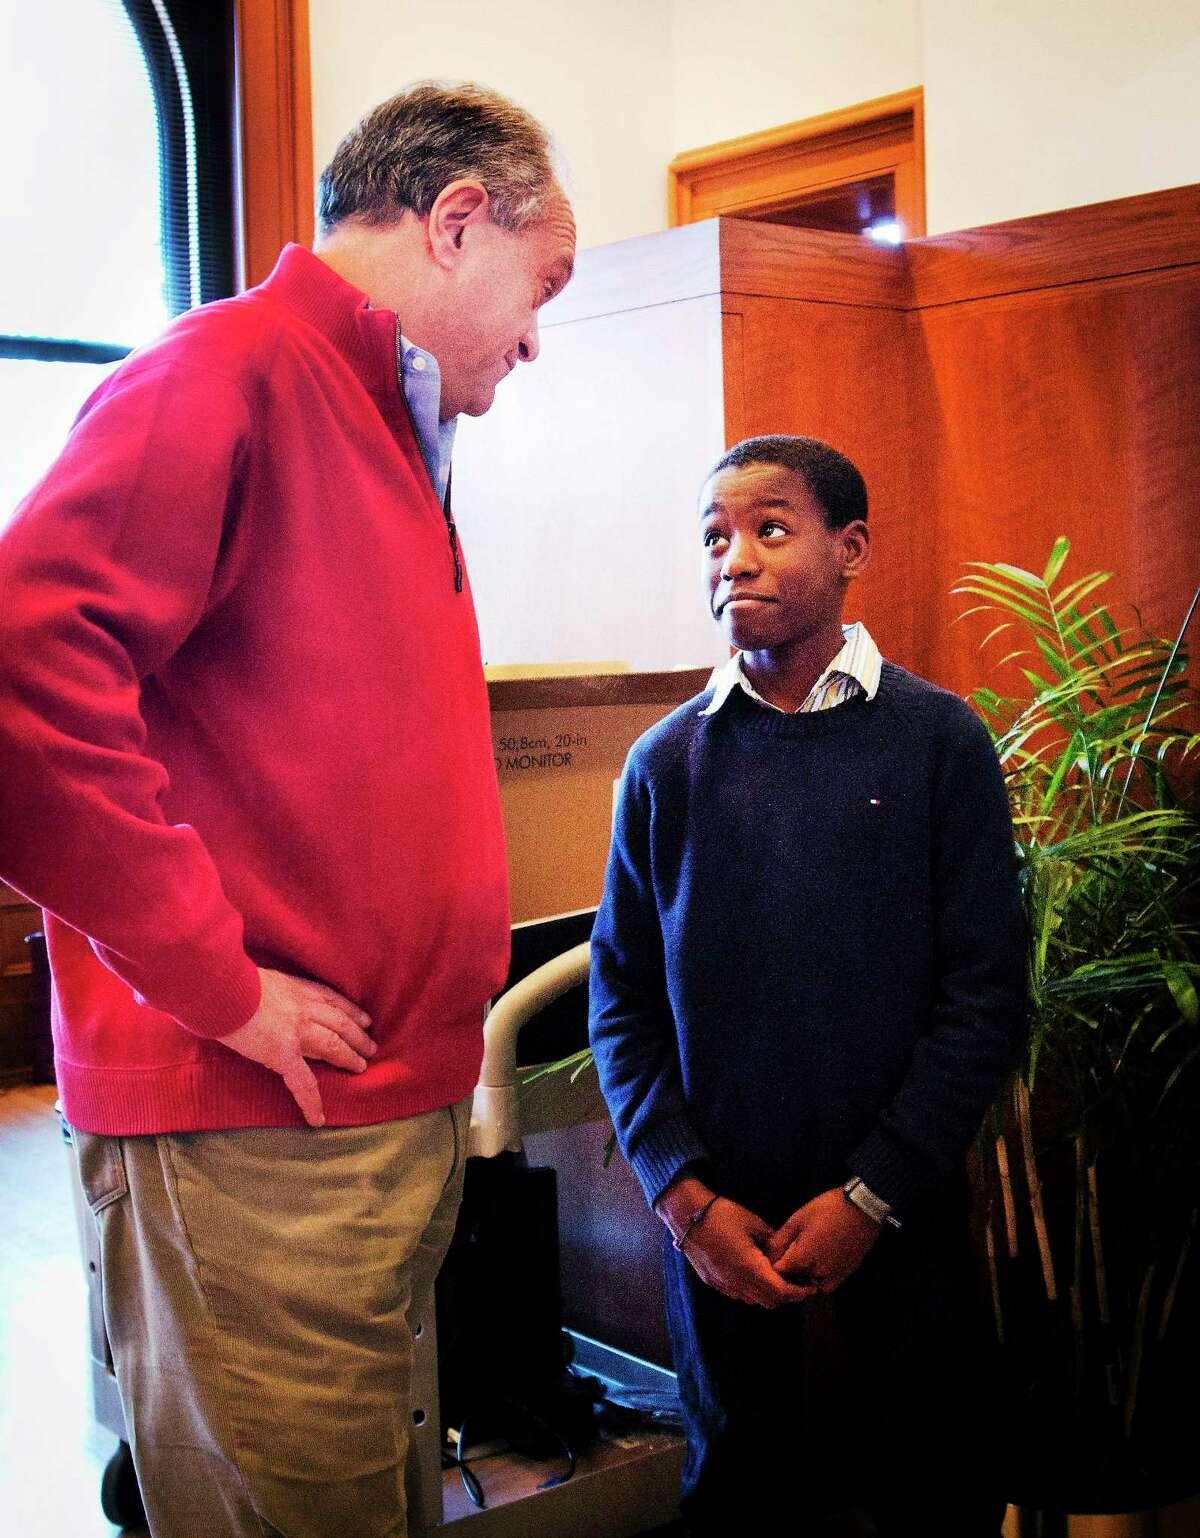 Mayor John DeStefano Jr., left, jokes with Caleb Bolden, 10, at City Hall Tuesday. Caleb is the son of Corporation Council Victor Bolden.